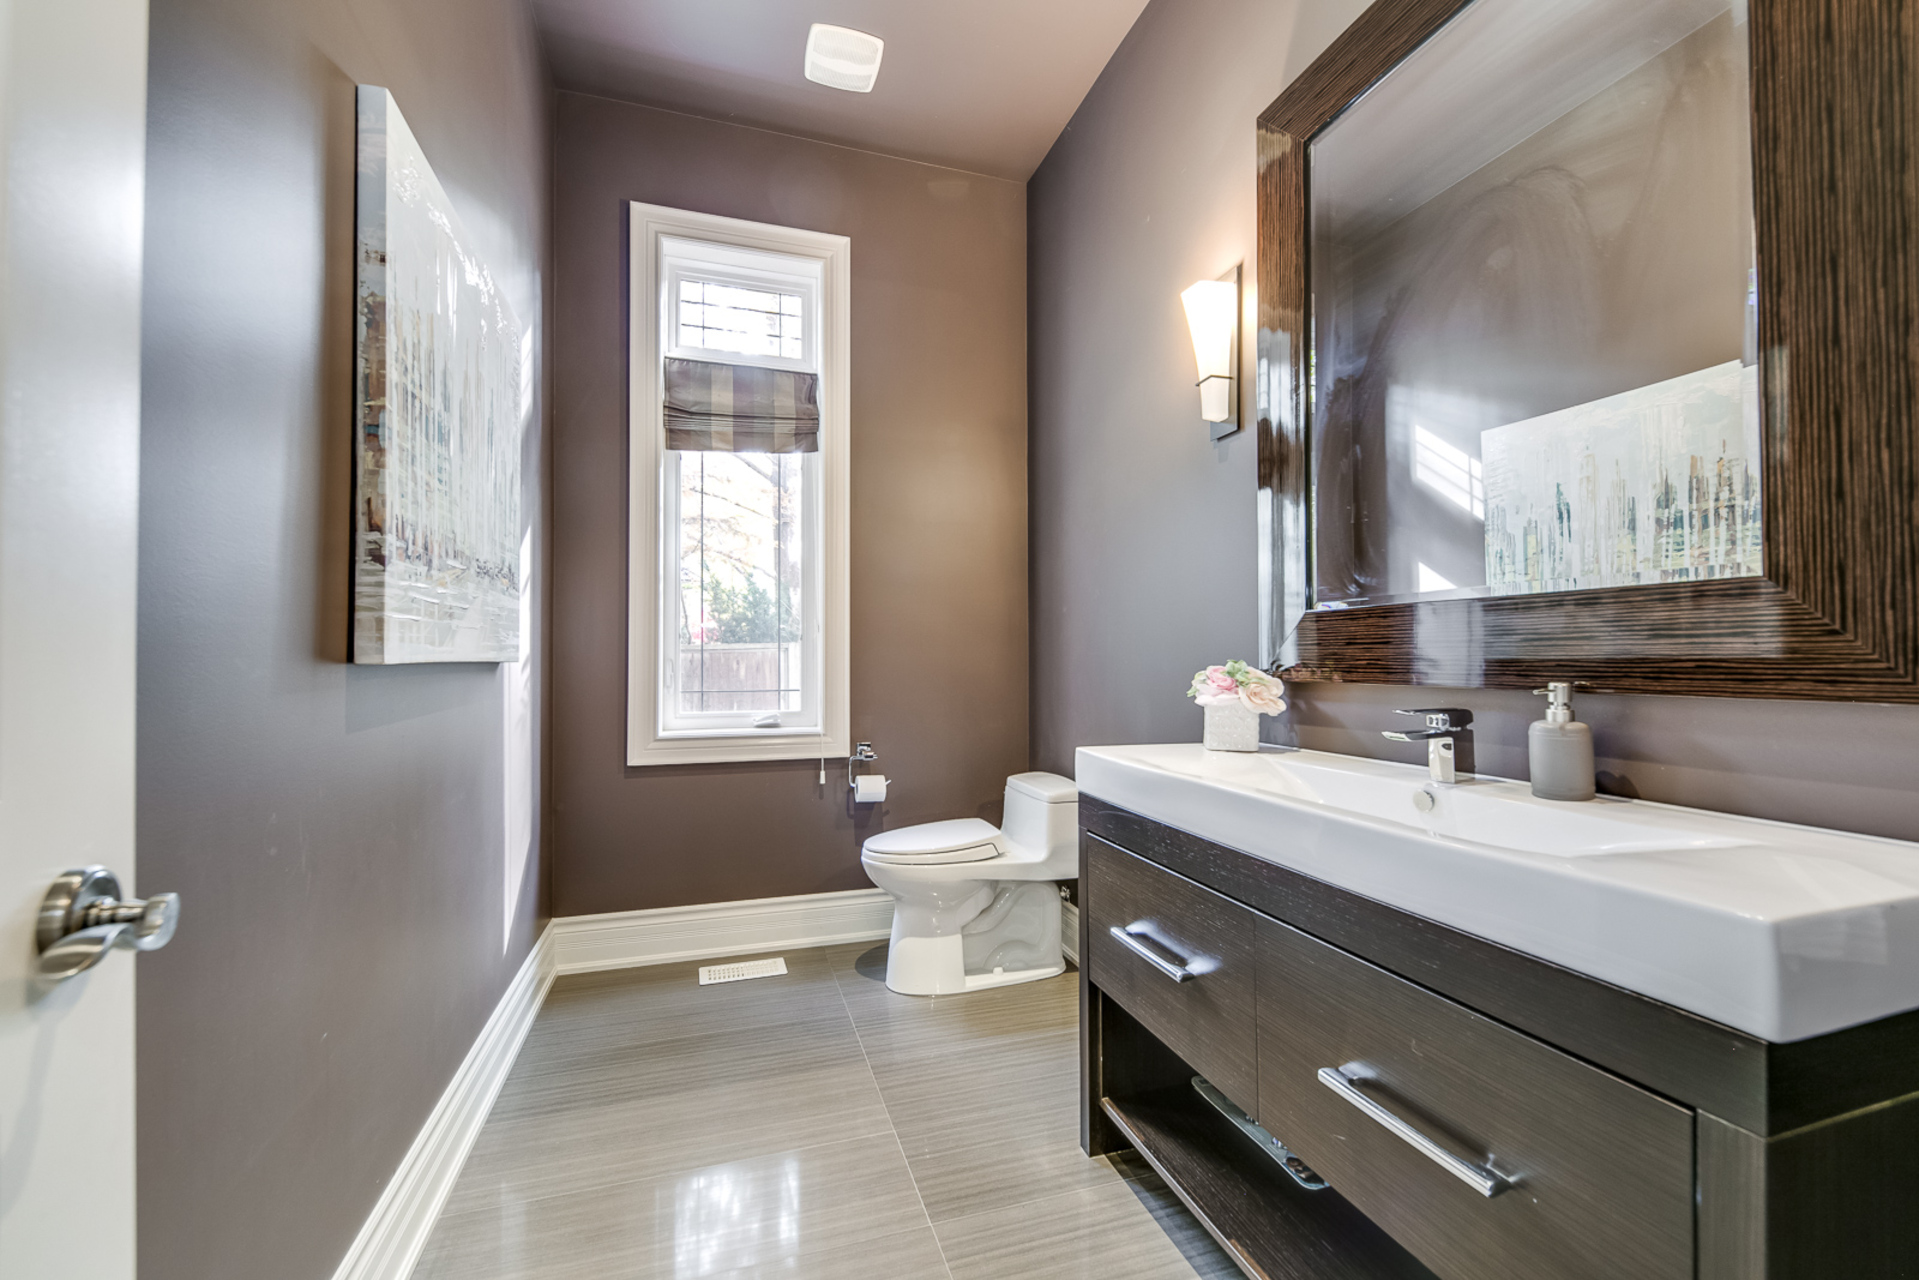 Powder Room - 5041 Lakeshore Rd, Burlington - Elite3 & Team at 5041 Lakeshore Road, Appleby, Burlington